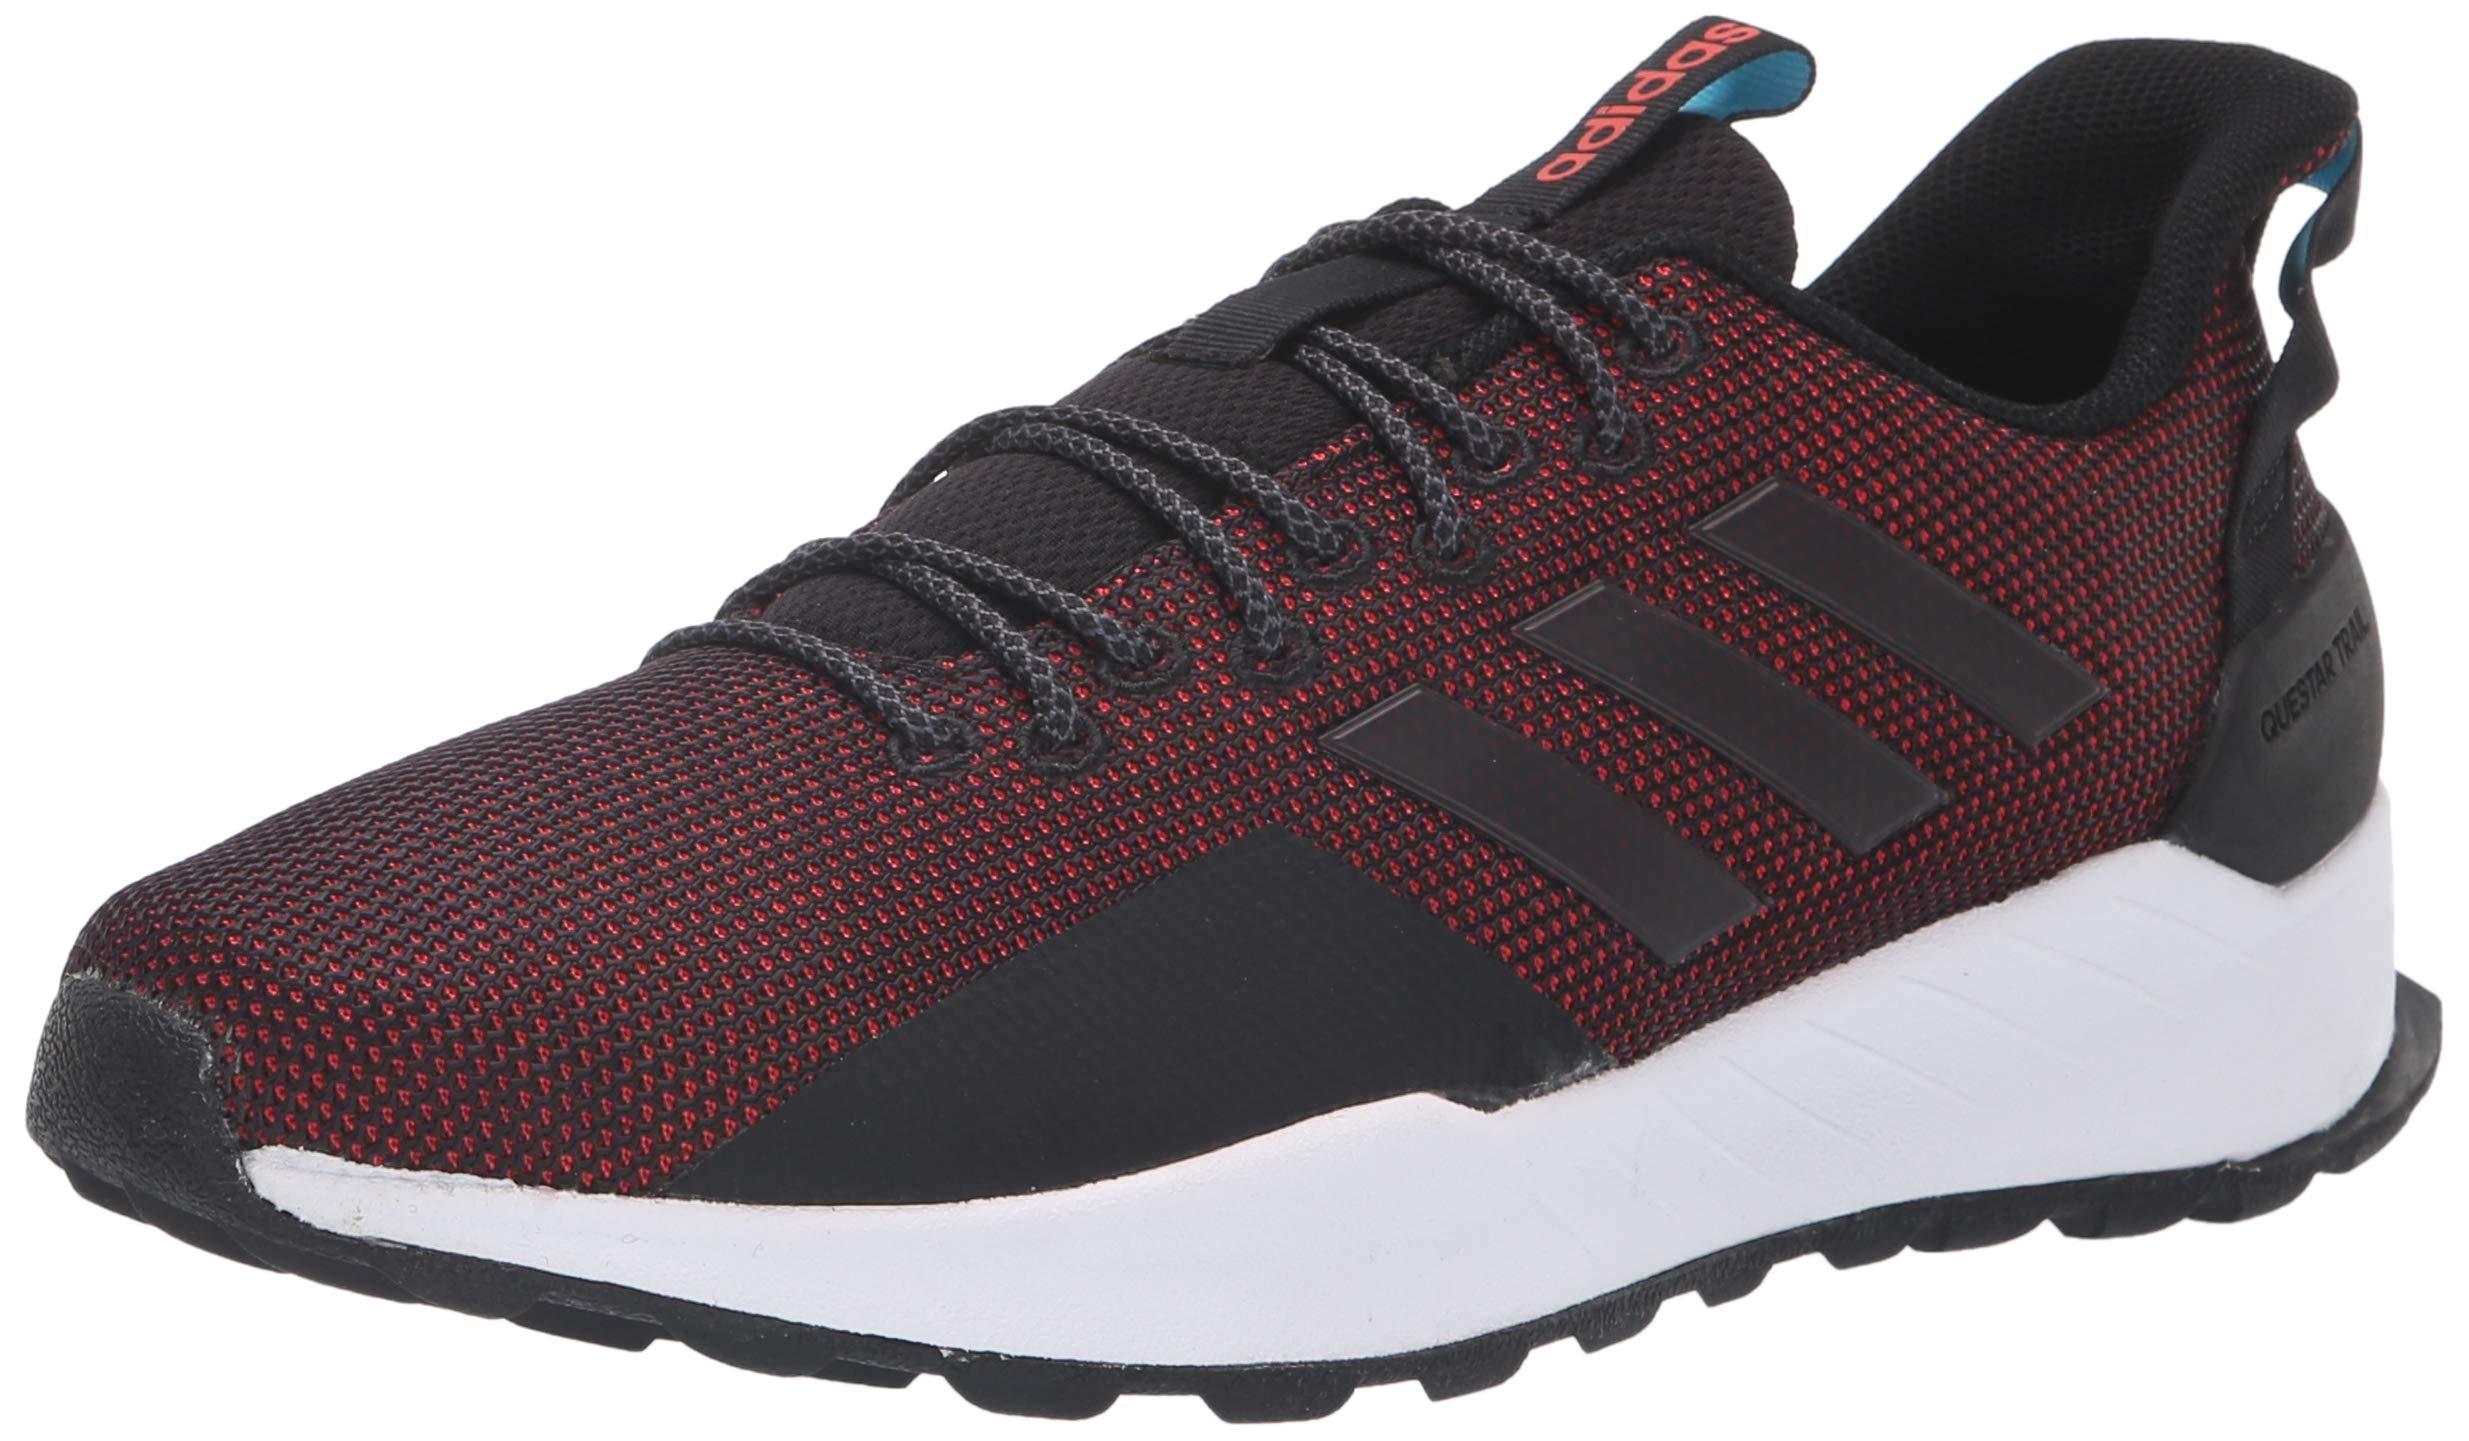 adidas Men's Questar Trail Running Shoe, Black/hi-res red, 11 M US by adidas